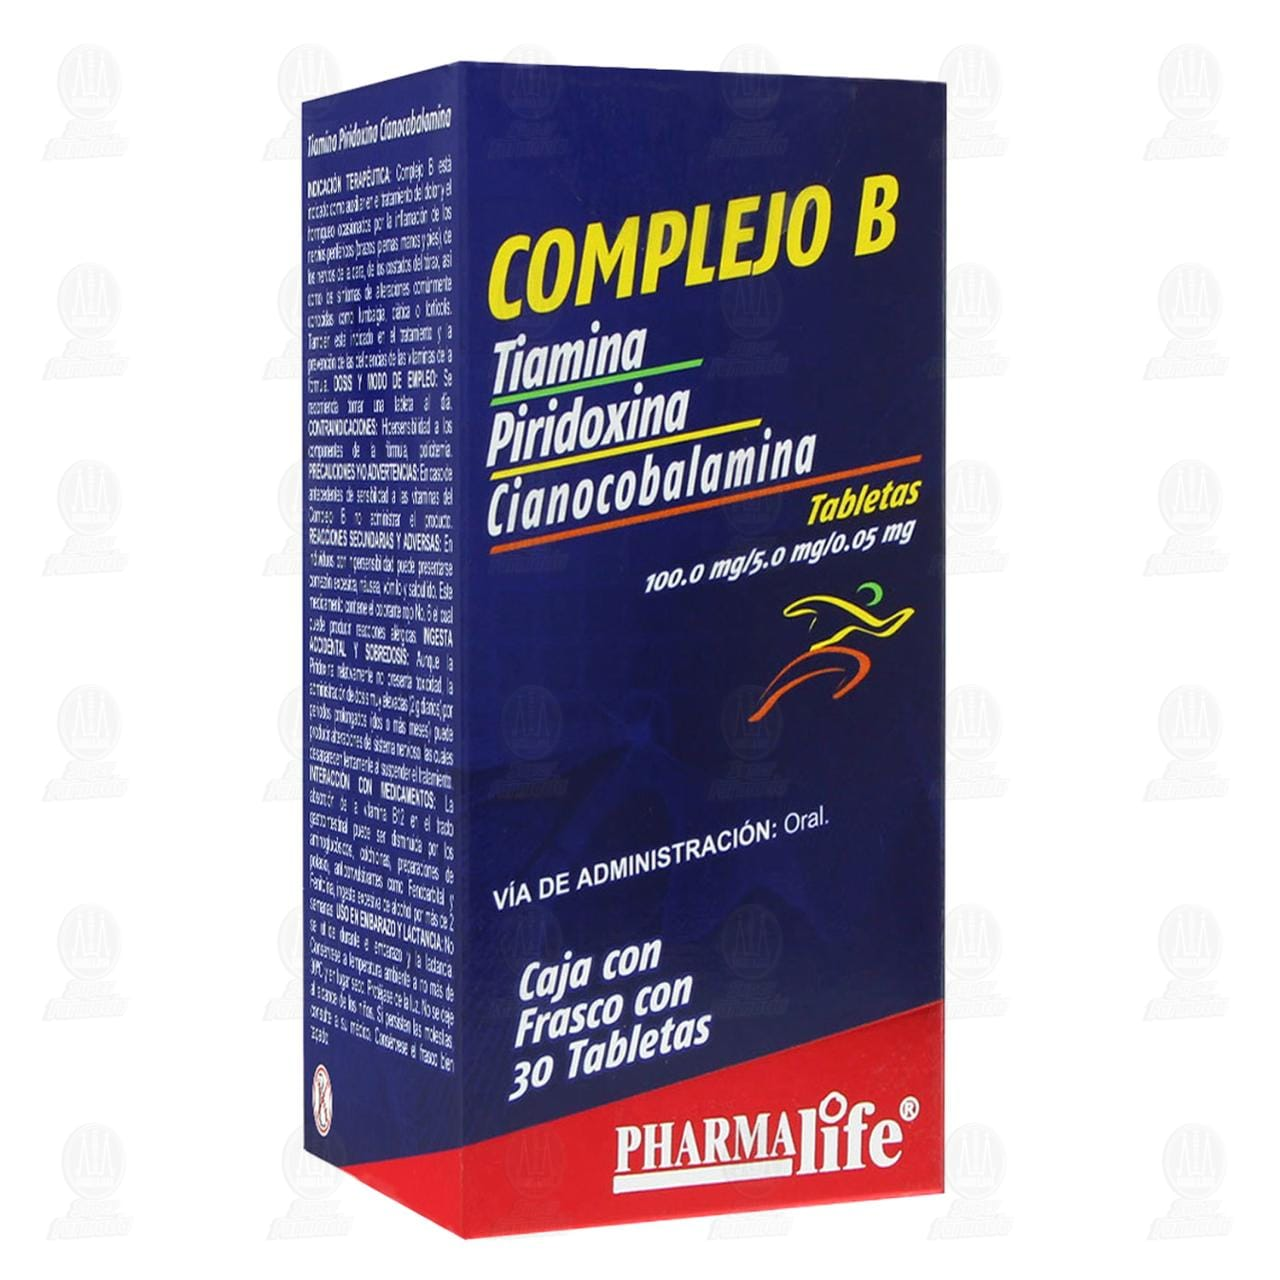 Comprar Complejo B 30 Tabletas Pharmalife en Farmacias Guadalajara